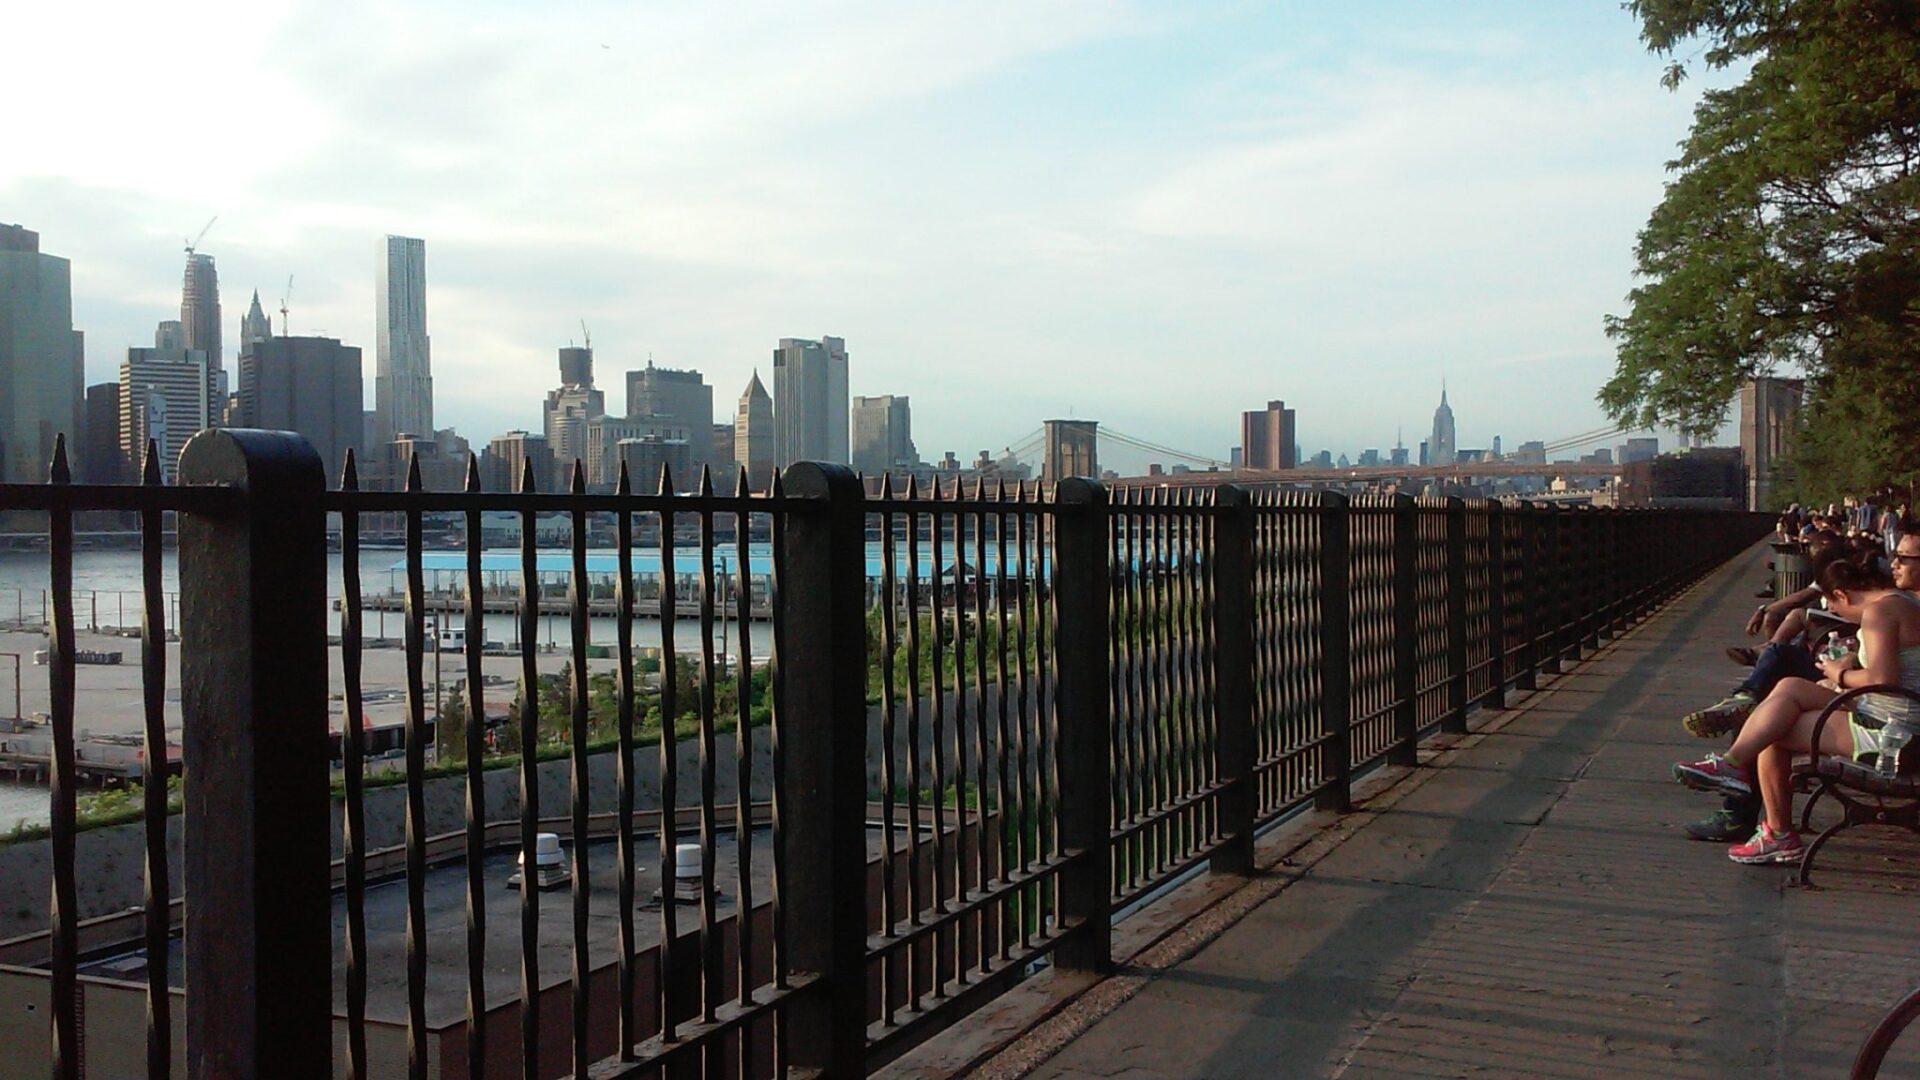 The Brooklyn Heights Promenade. Photo: Ilaria M. P. Barzaghi.